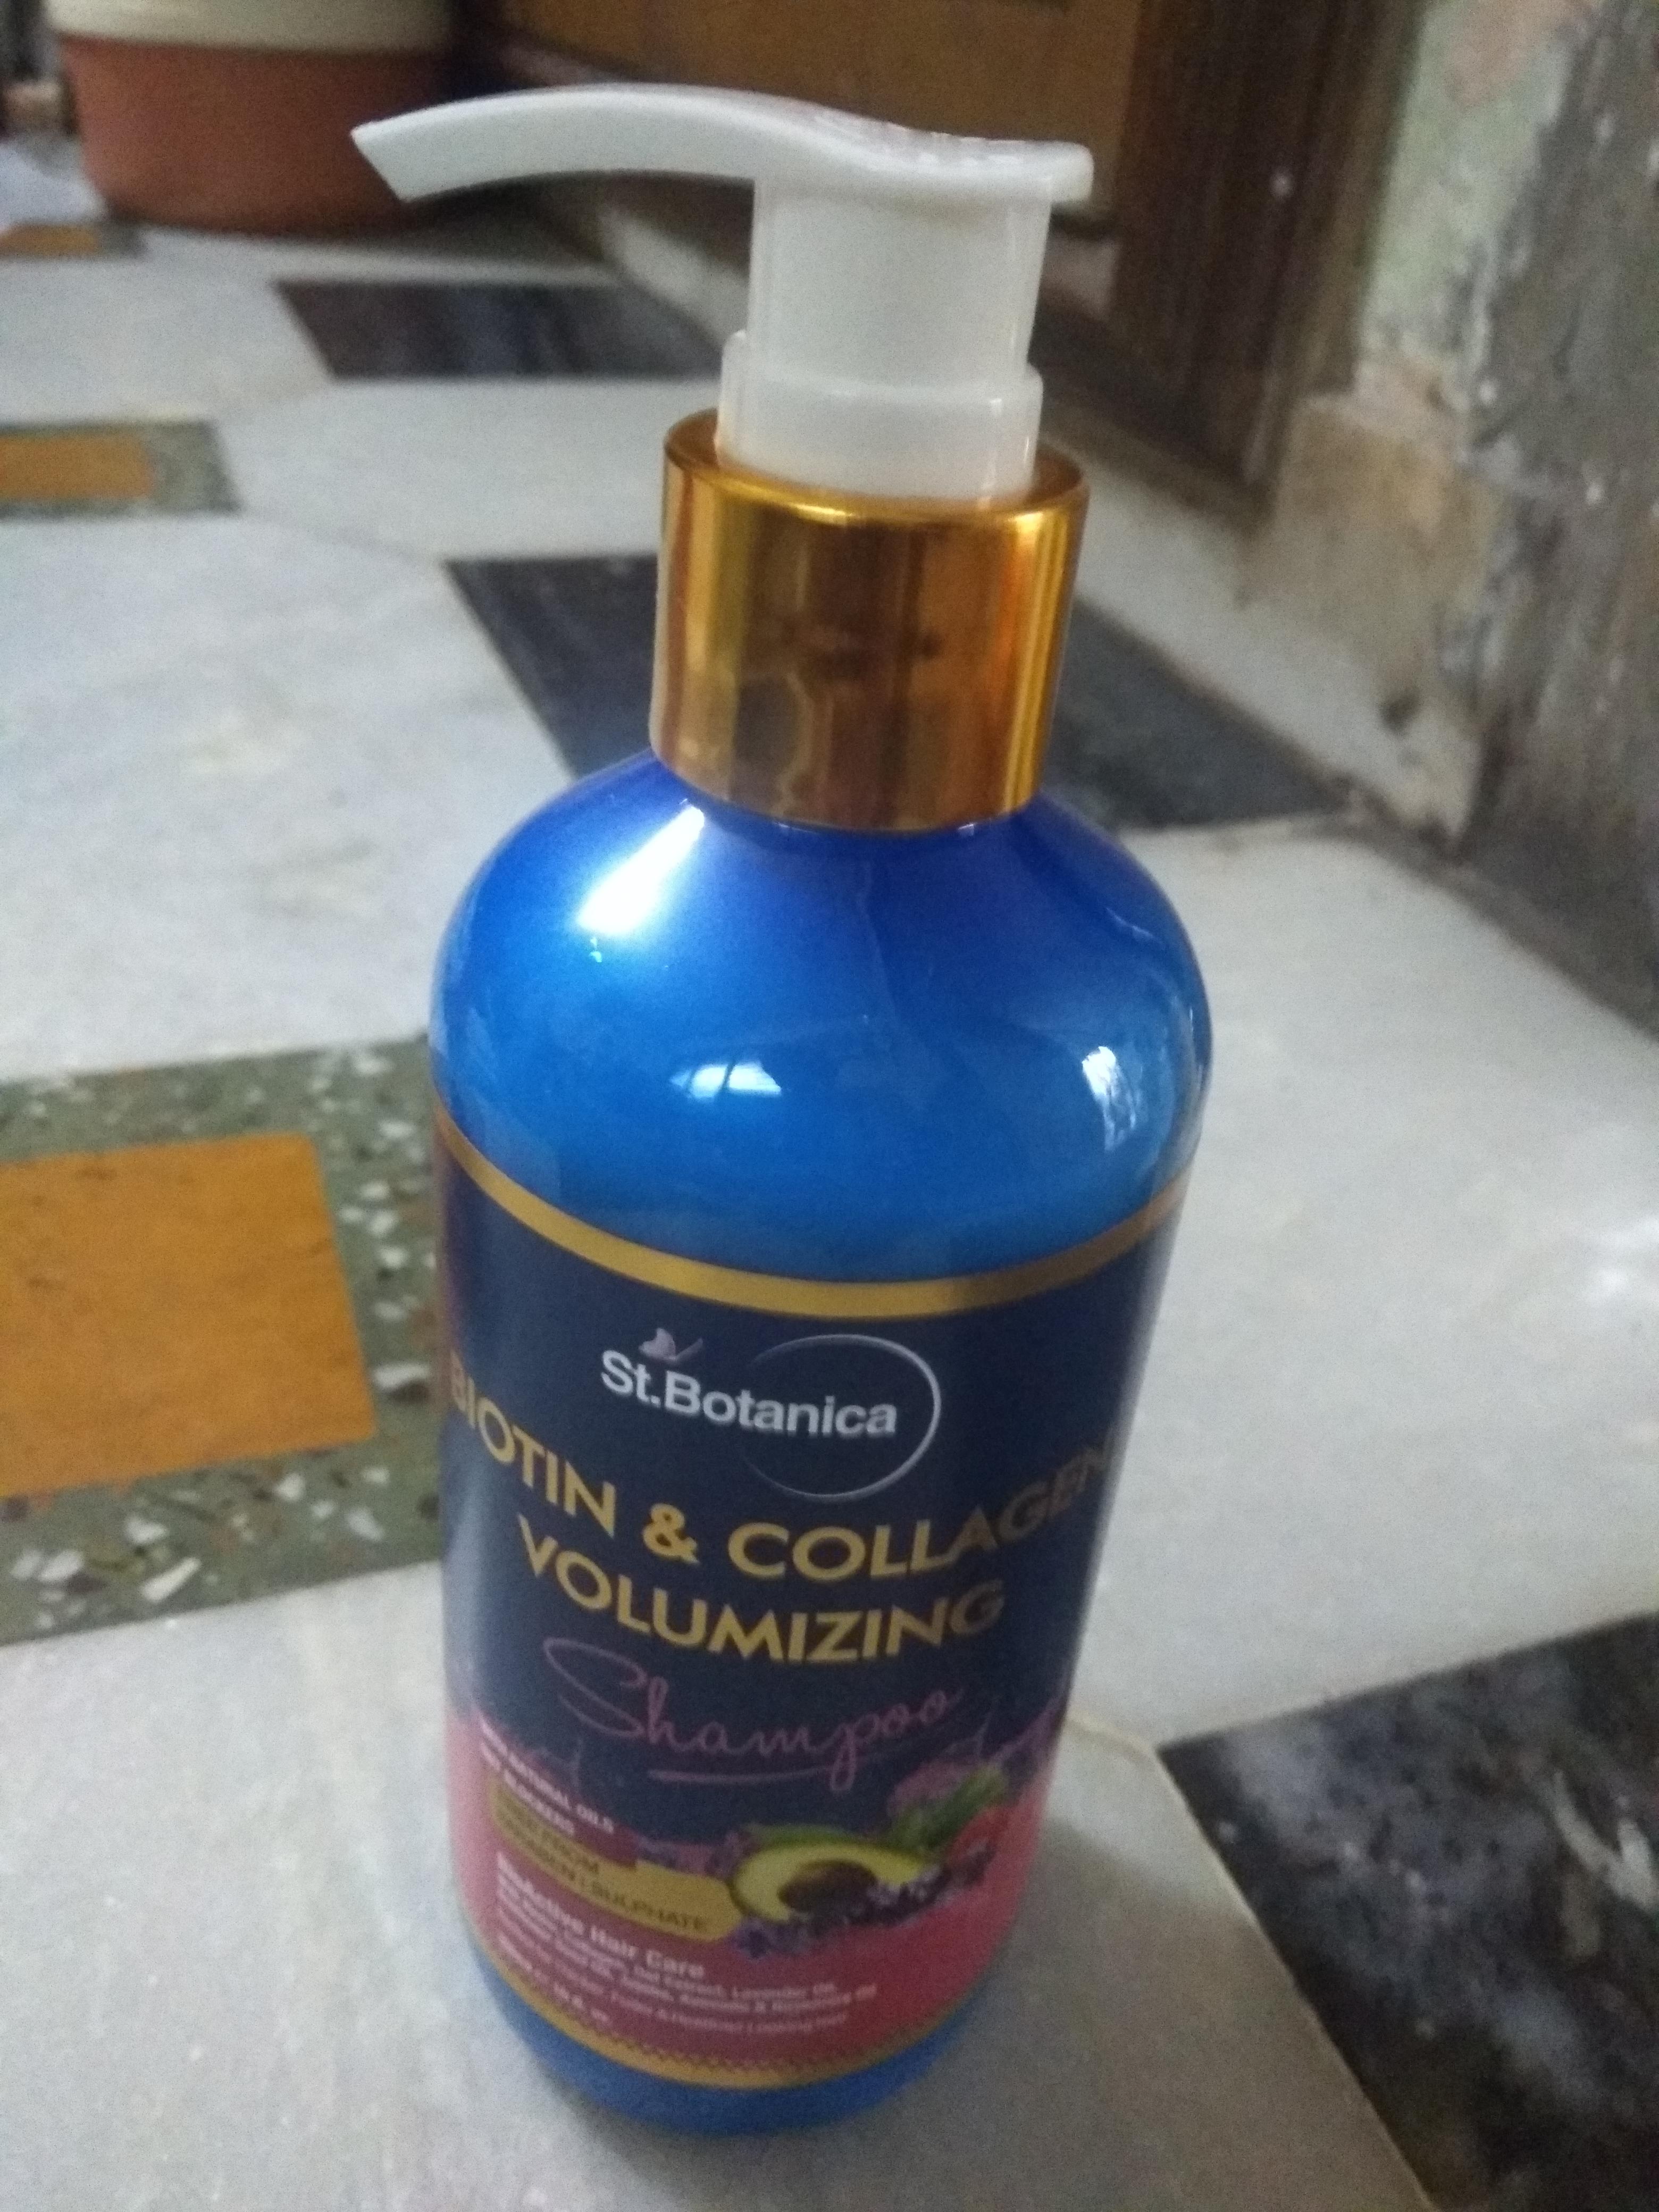 St.Botanica Biotin & Collagen Volumizing Hair Shampoo-Good one-By krishnalimbad-1